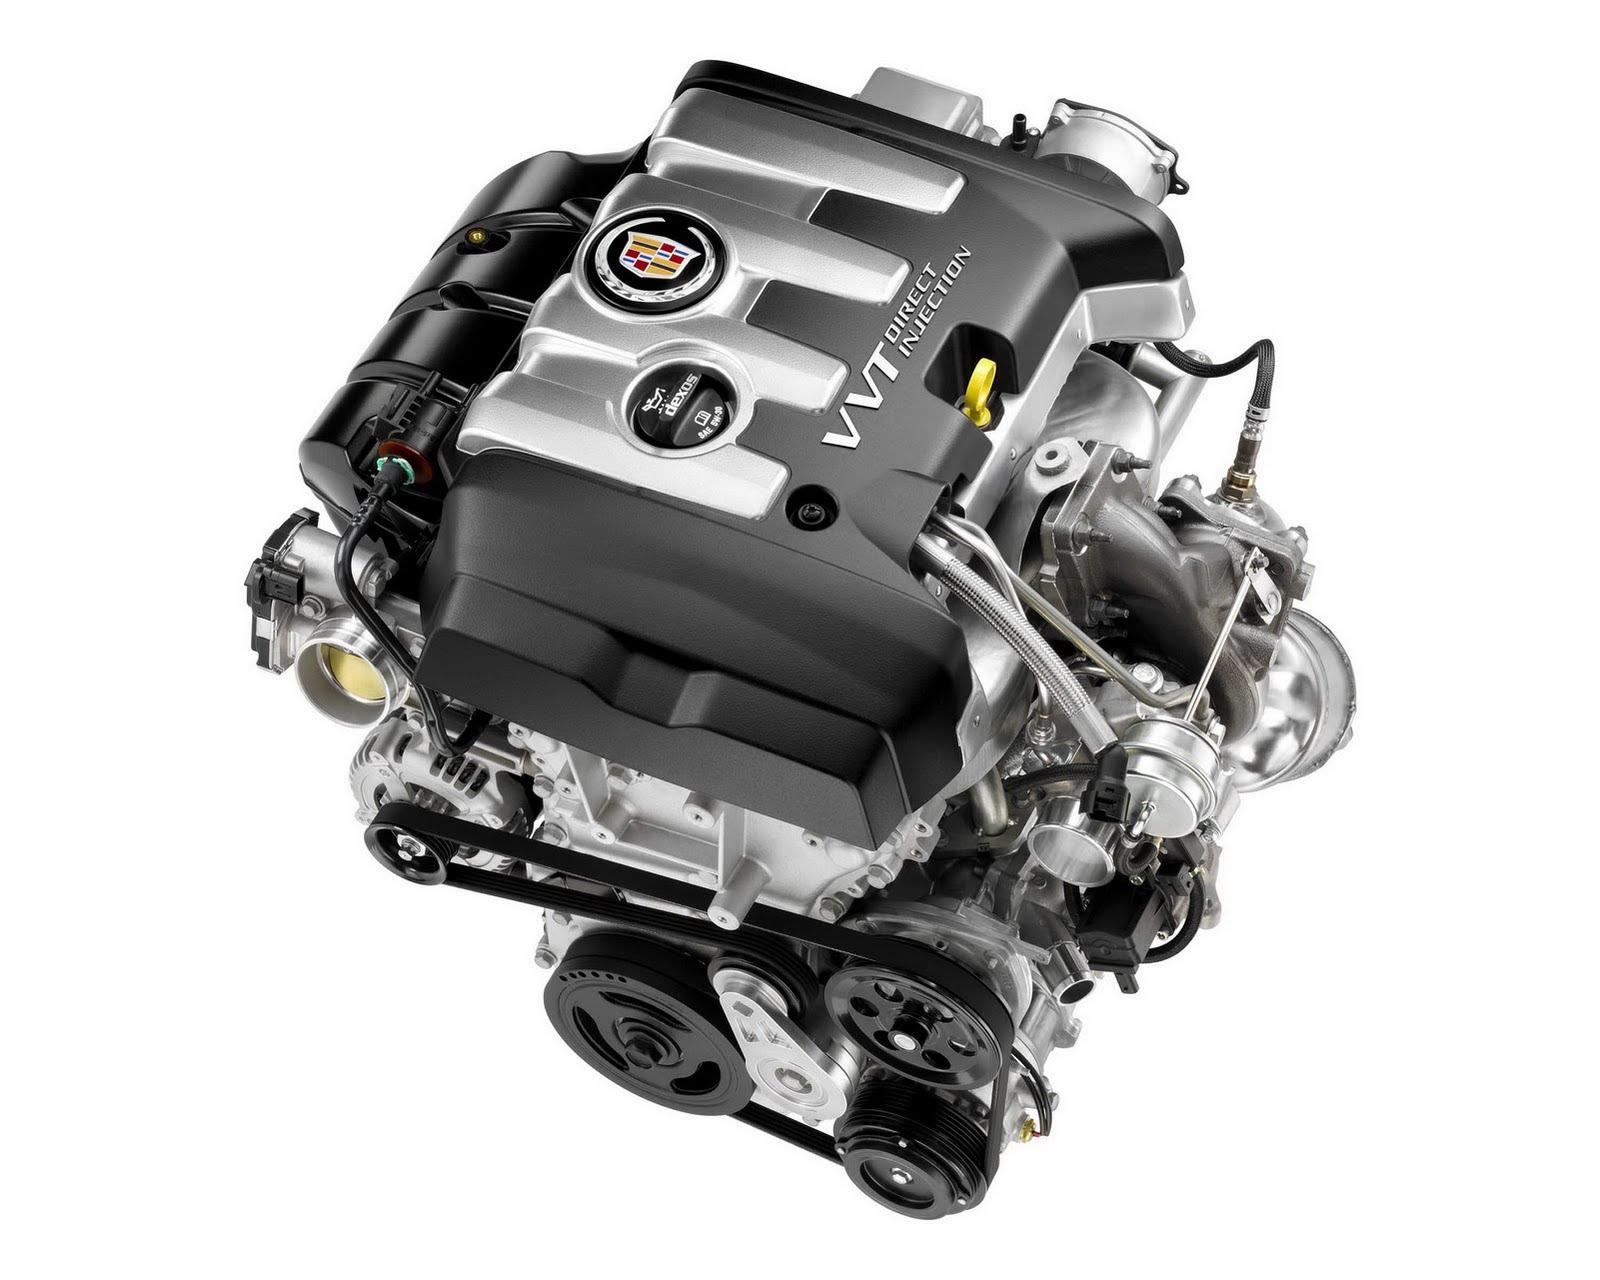 2013 Cadillac ATS Engines: 270 HP 2.0L Turbo, 2.5L and 3 ...